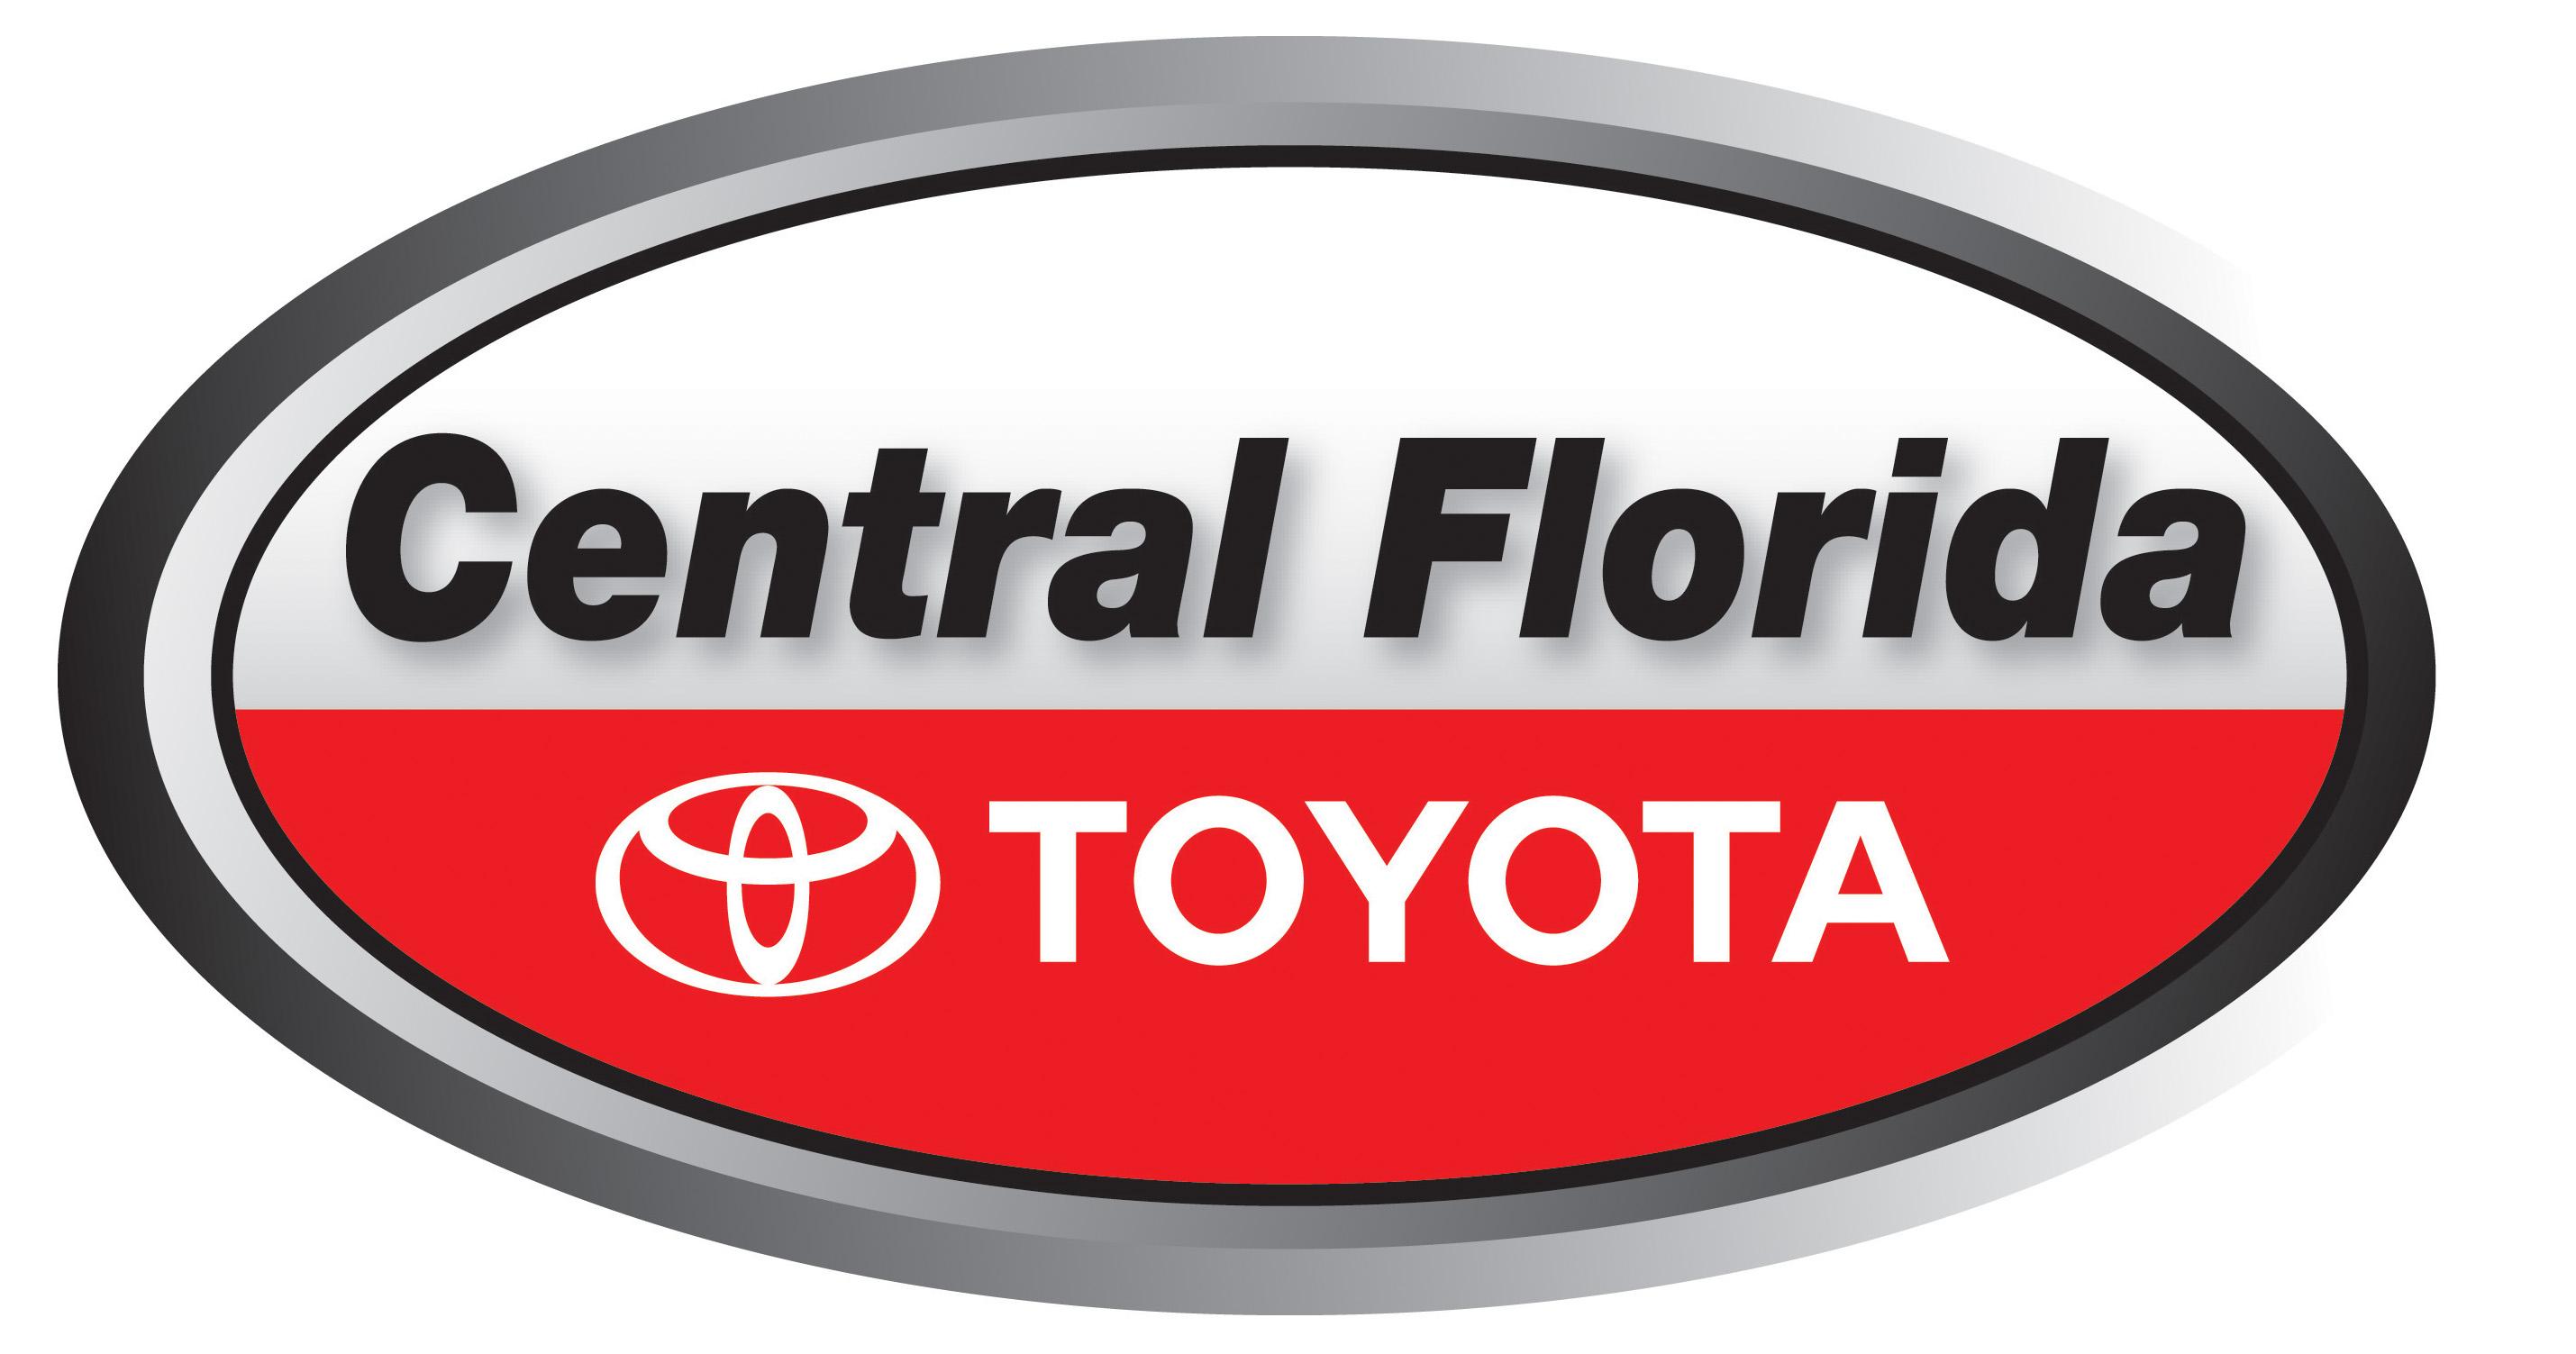 2010 dealership website awards central florida toyota strong automotive merchandising